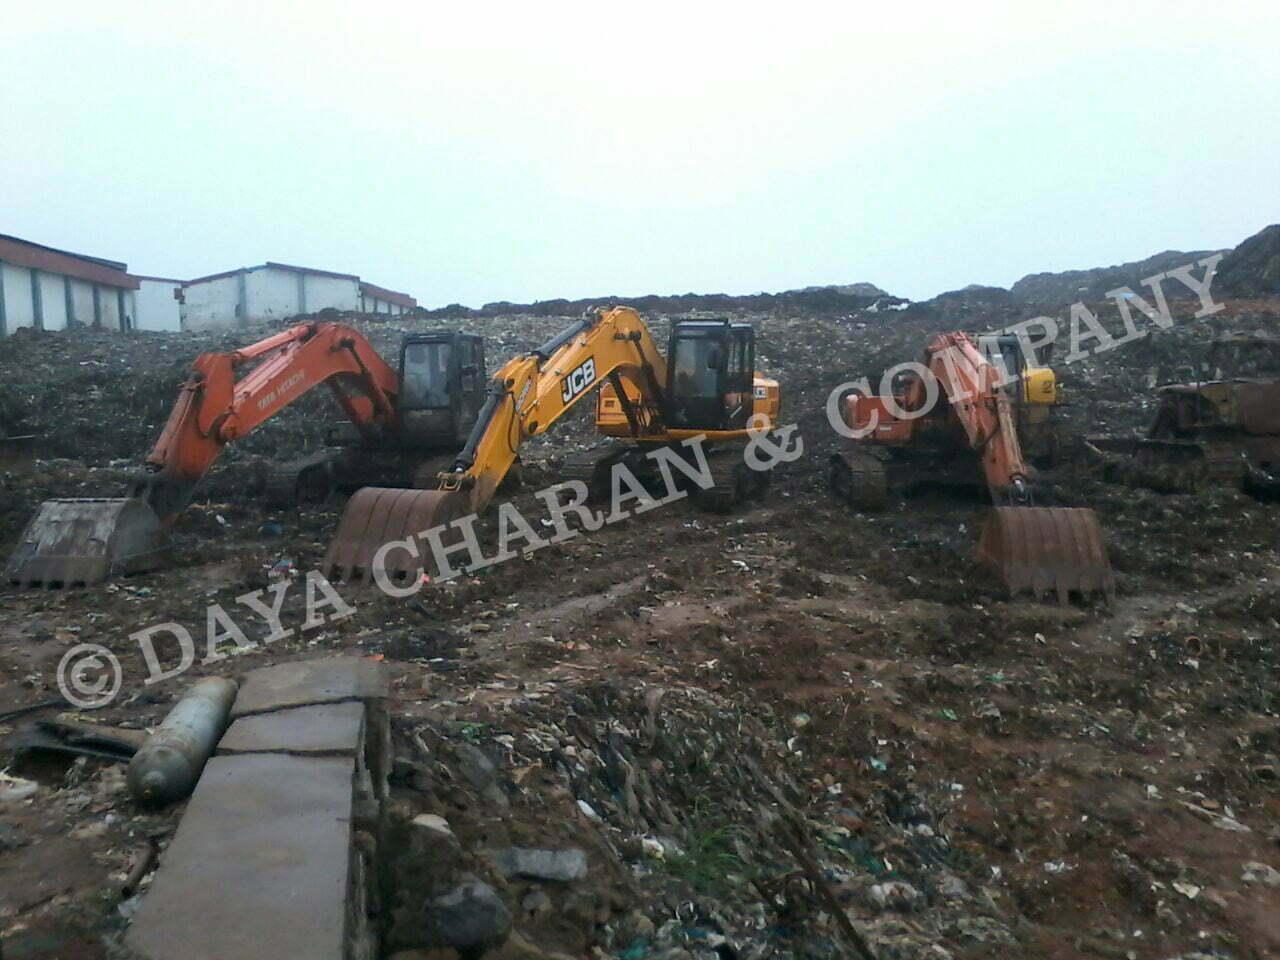 Landfill Construction waste